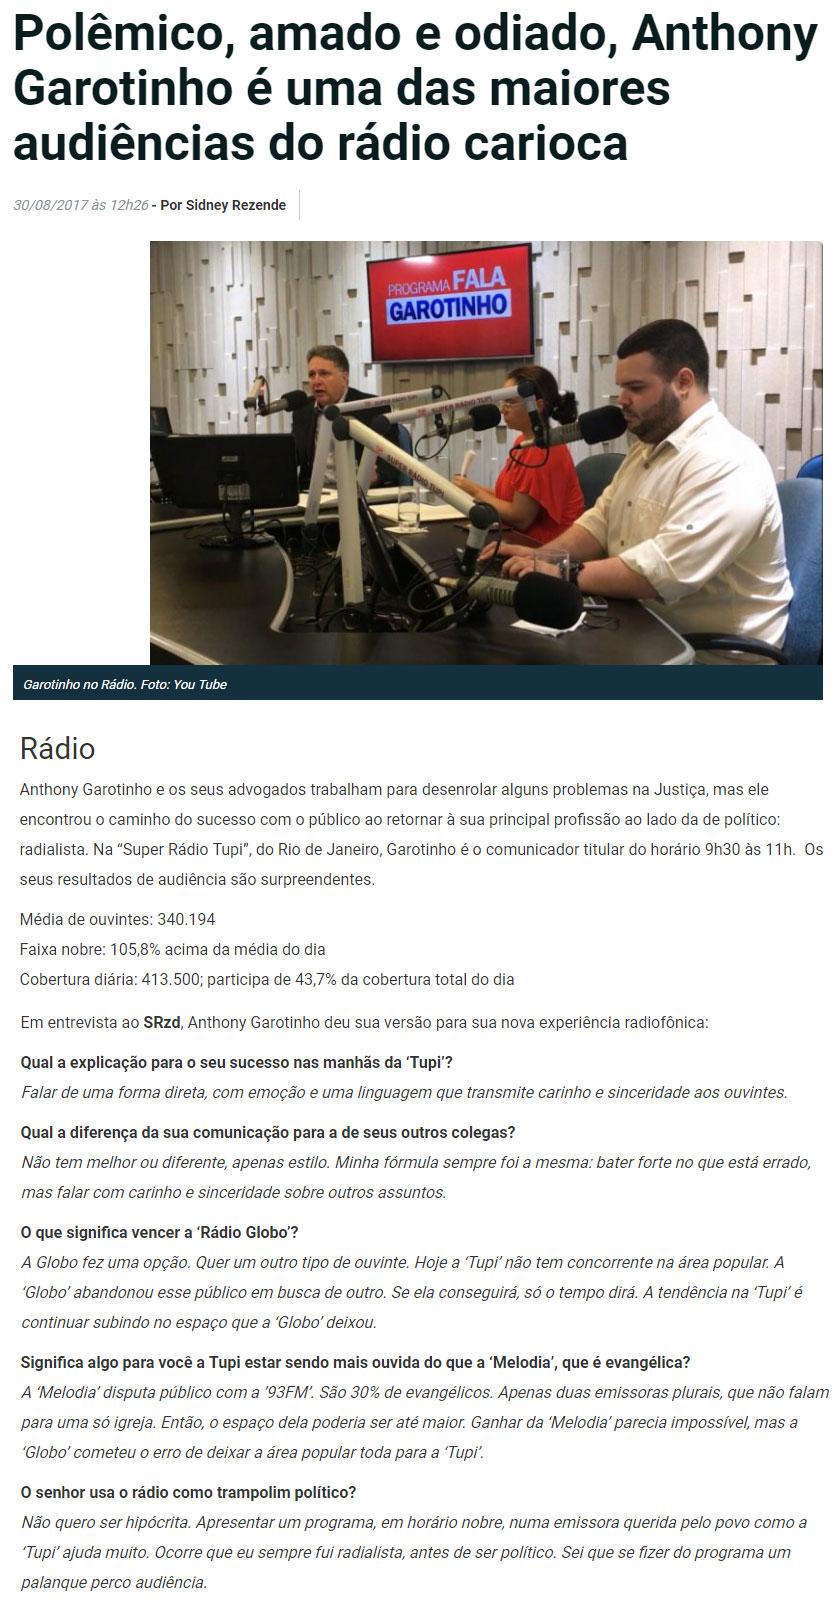 Reprodução do site SRzd, do jornalista Sidney Rezende